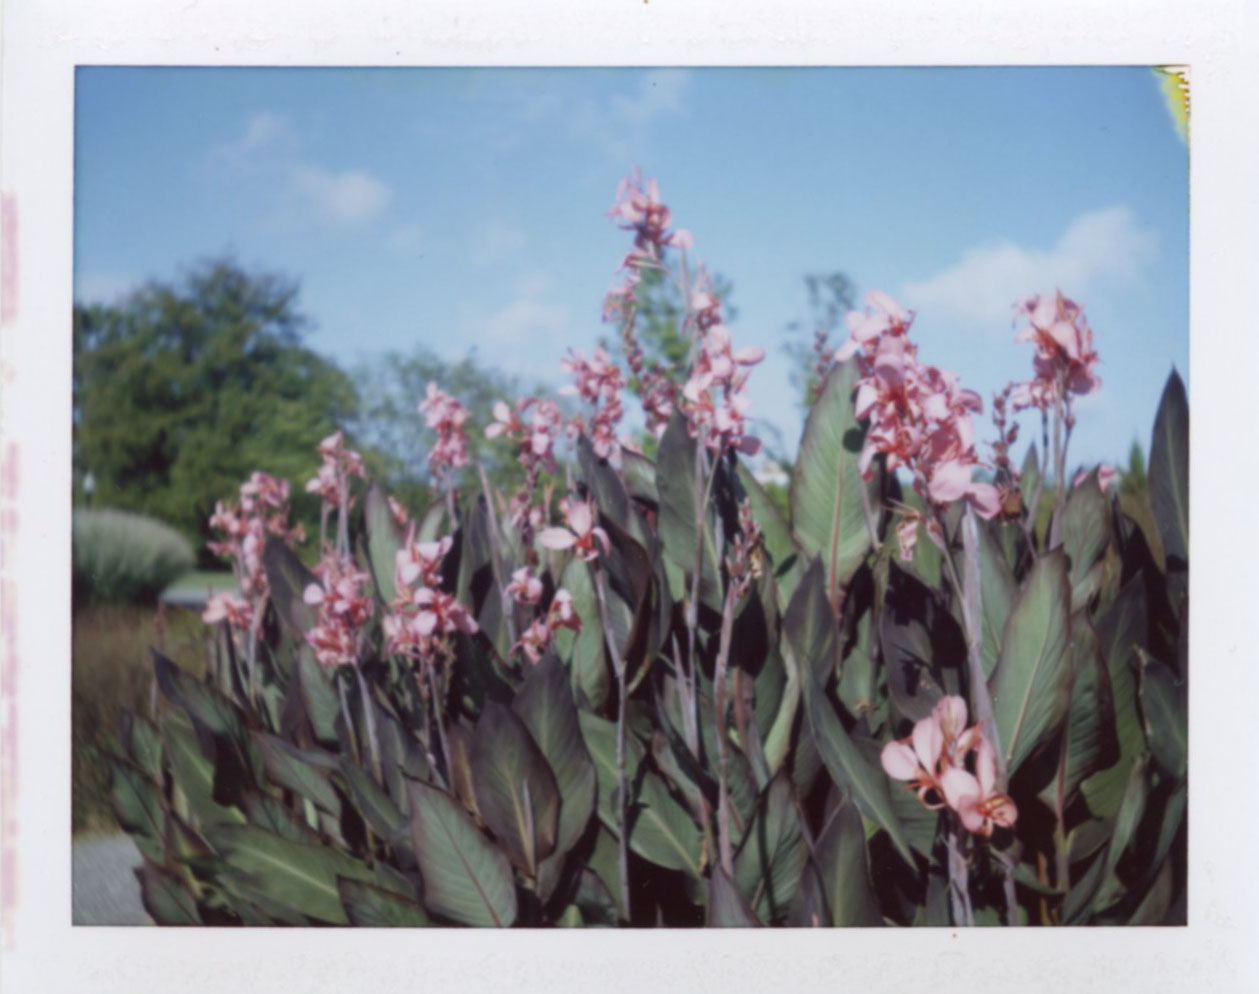 cylburn_arboretum_garden.jpg